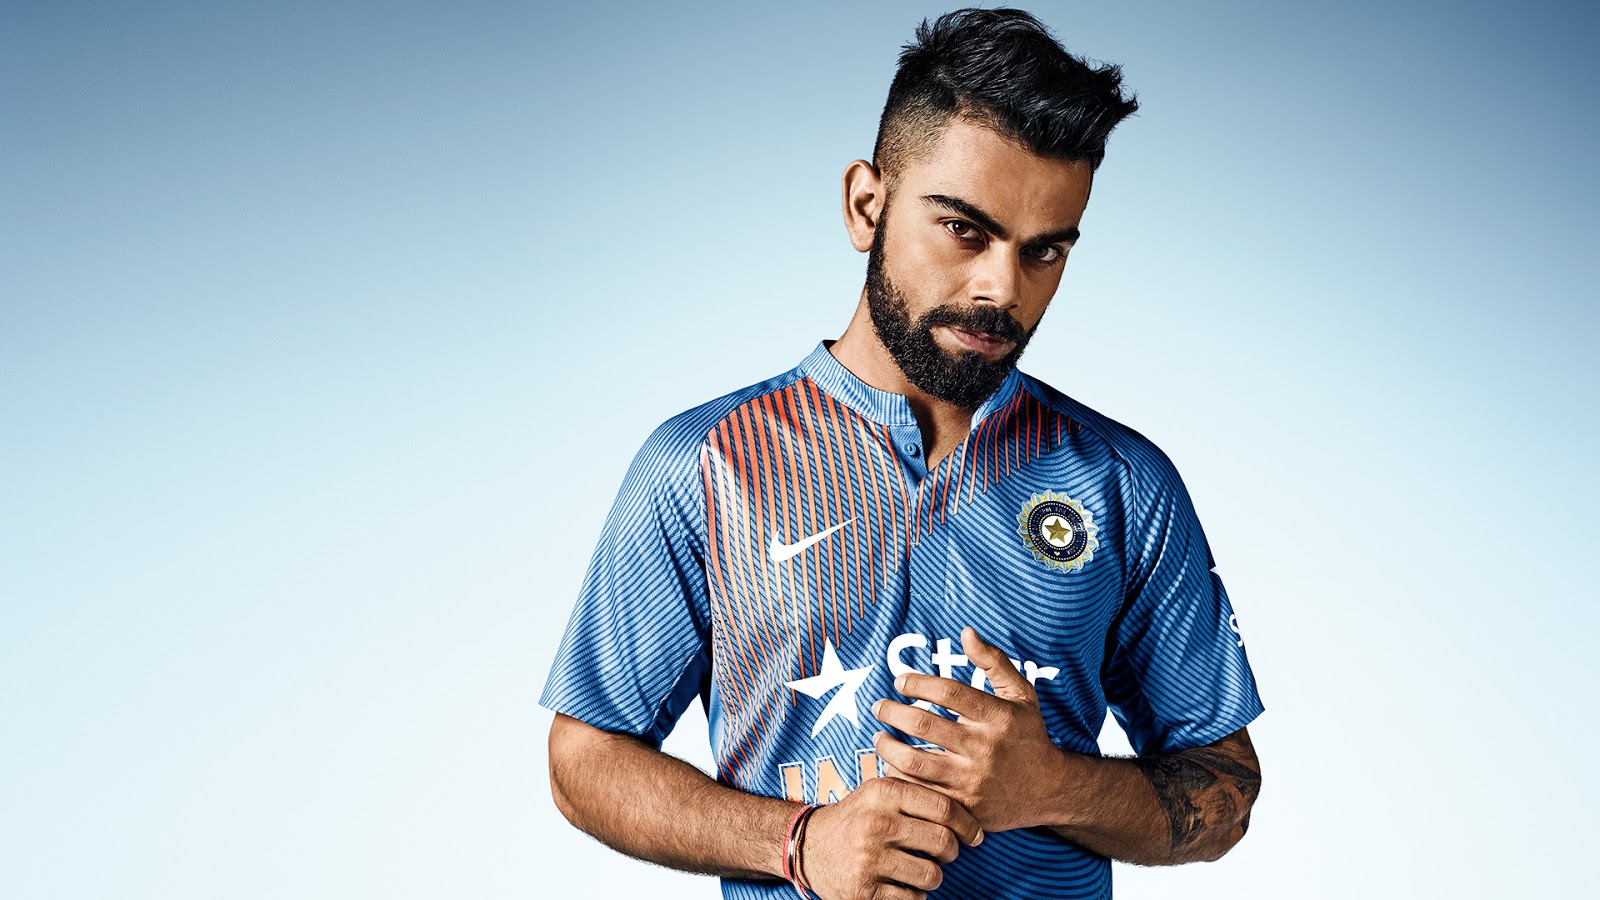 virat kohli india cricketer hd wallpaper | latest bollywood